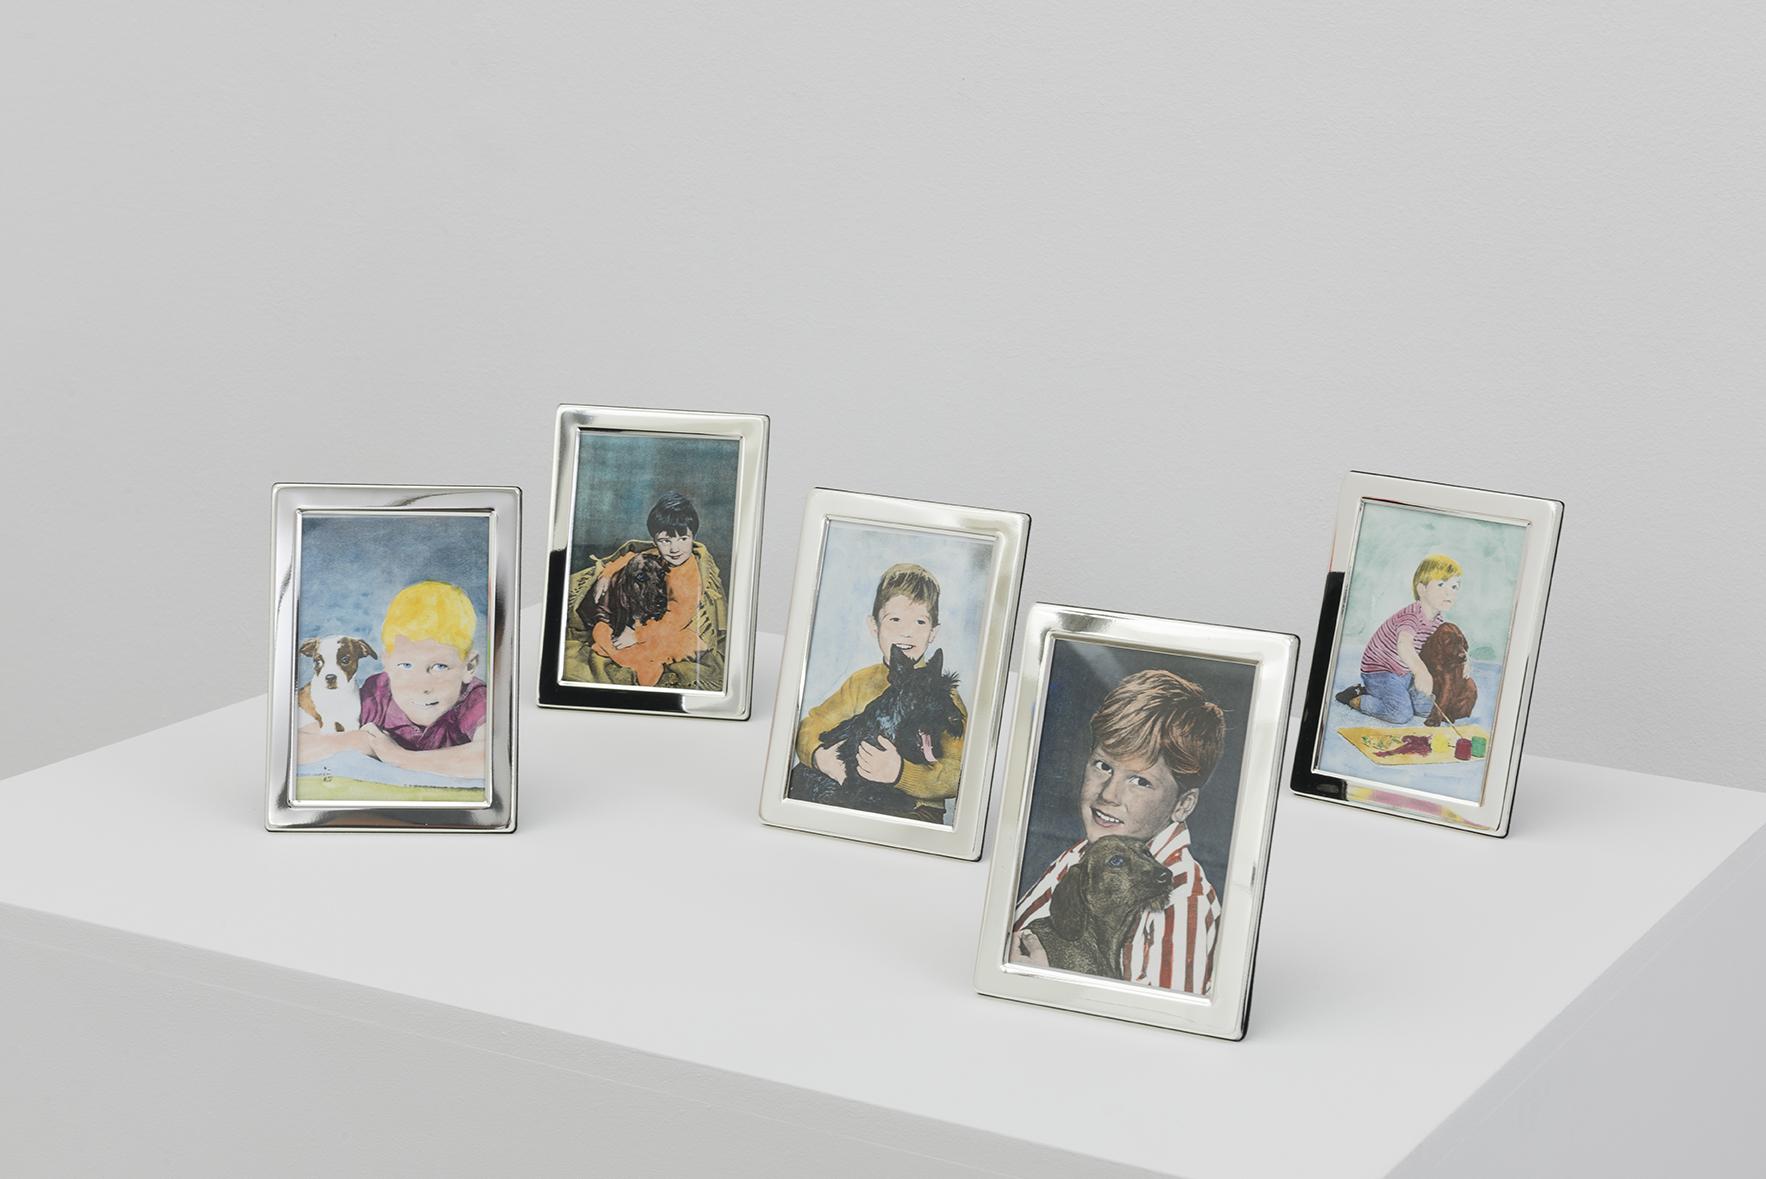 HANS-PETER FELDMANN.Children portraits, 1970's | ACCROCHAGE #1: Allen Ruppersberg et Al. | ProjecteSD